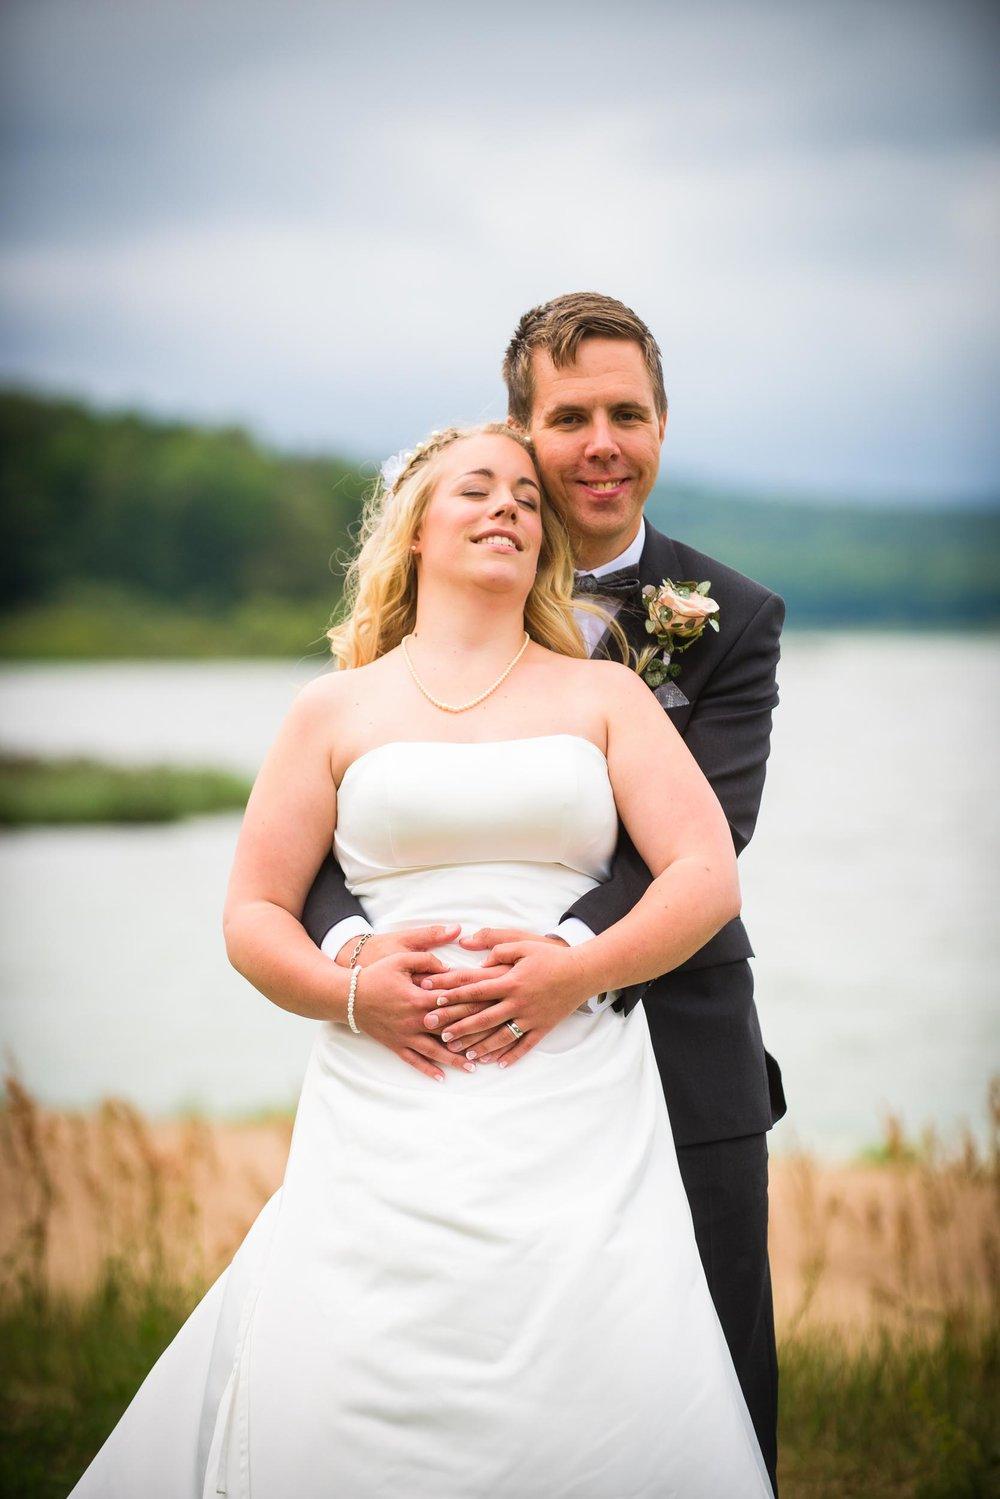 bröllopsfoto-tyringe-aug17-5.jpg